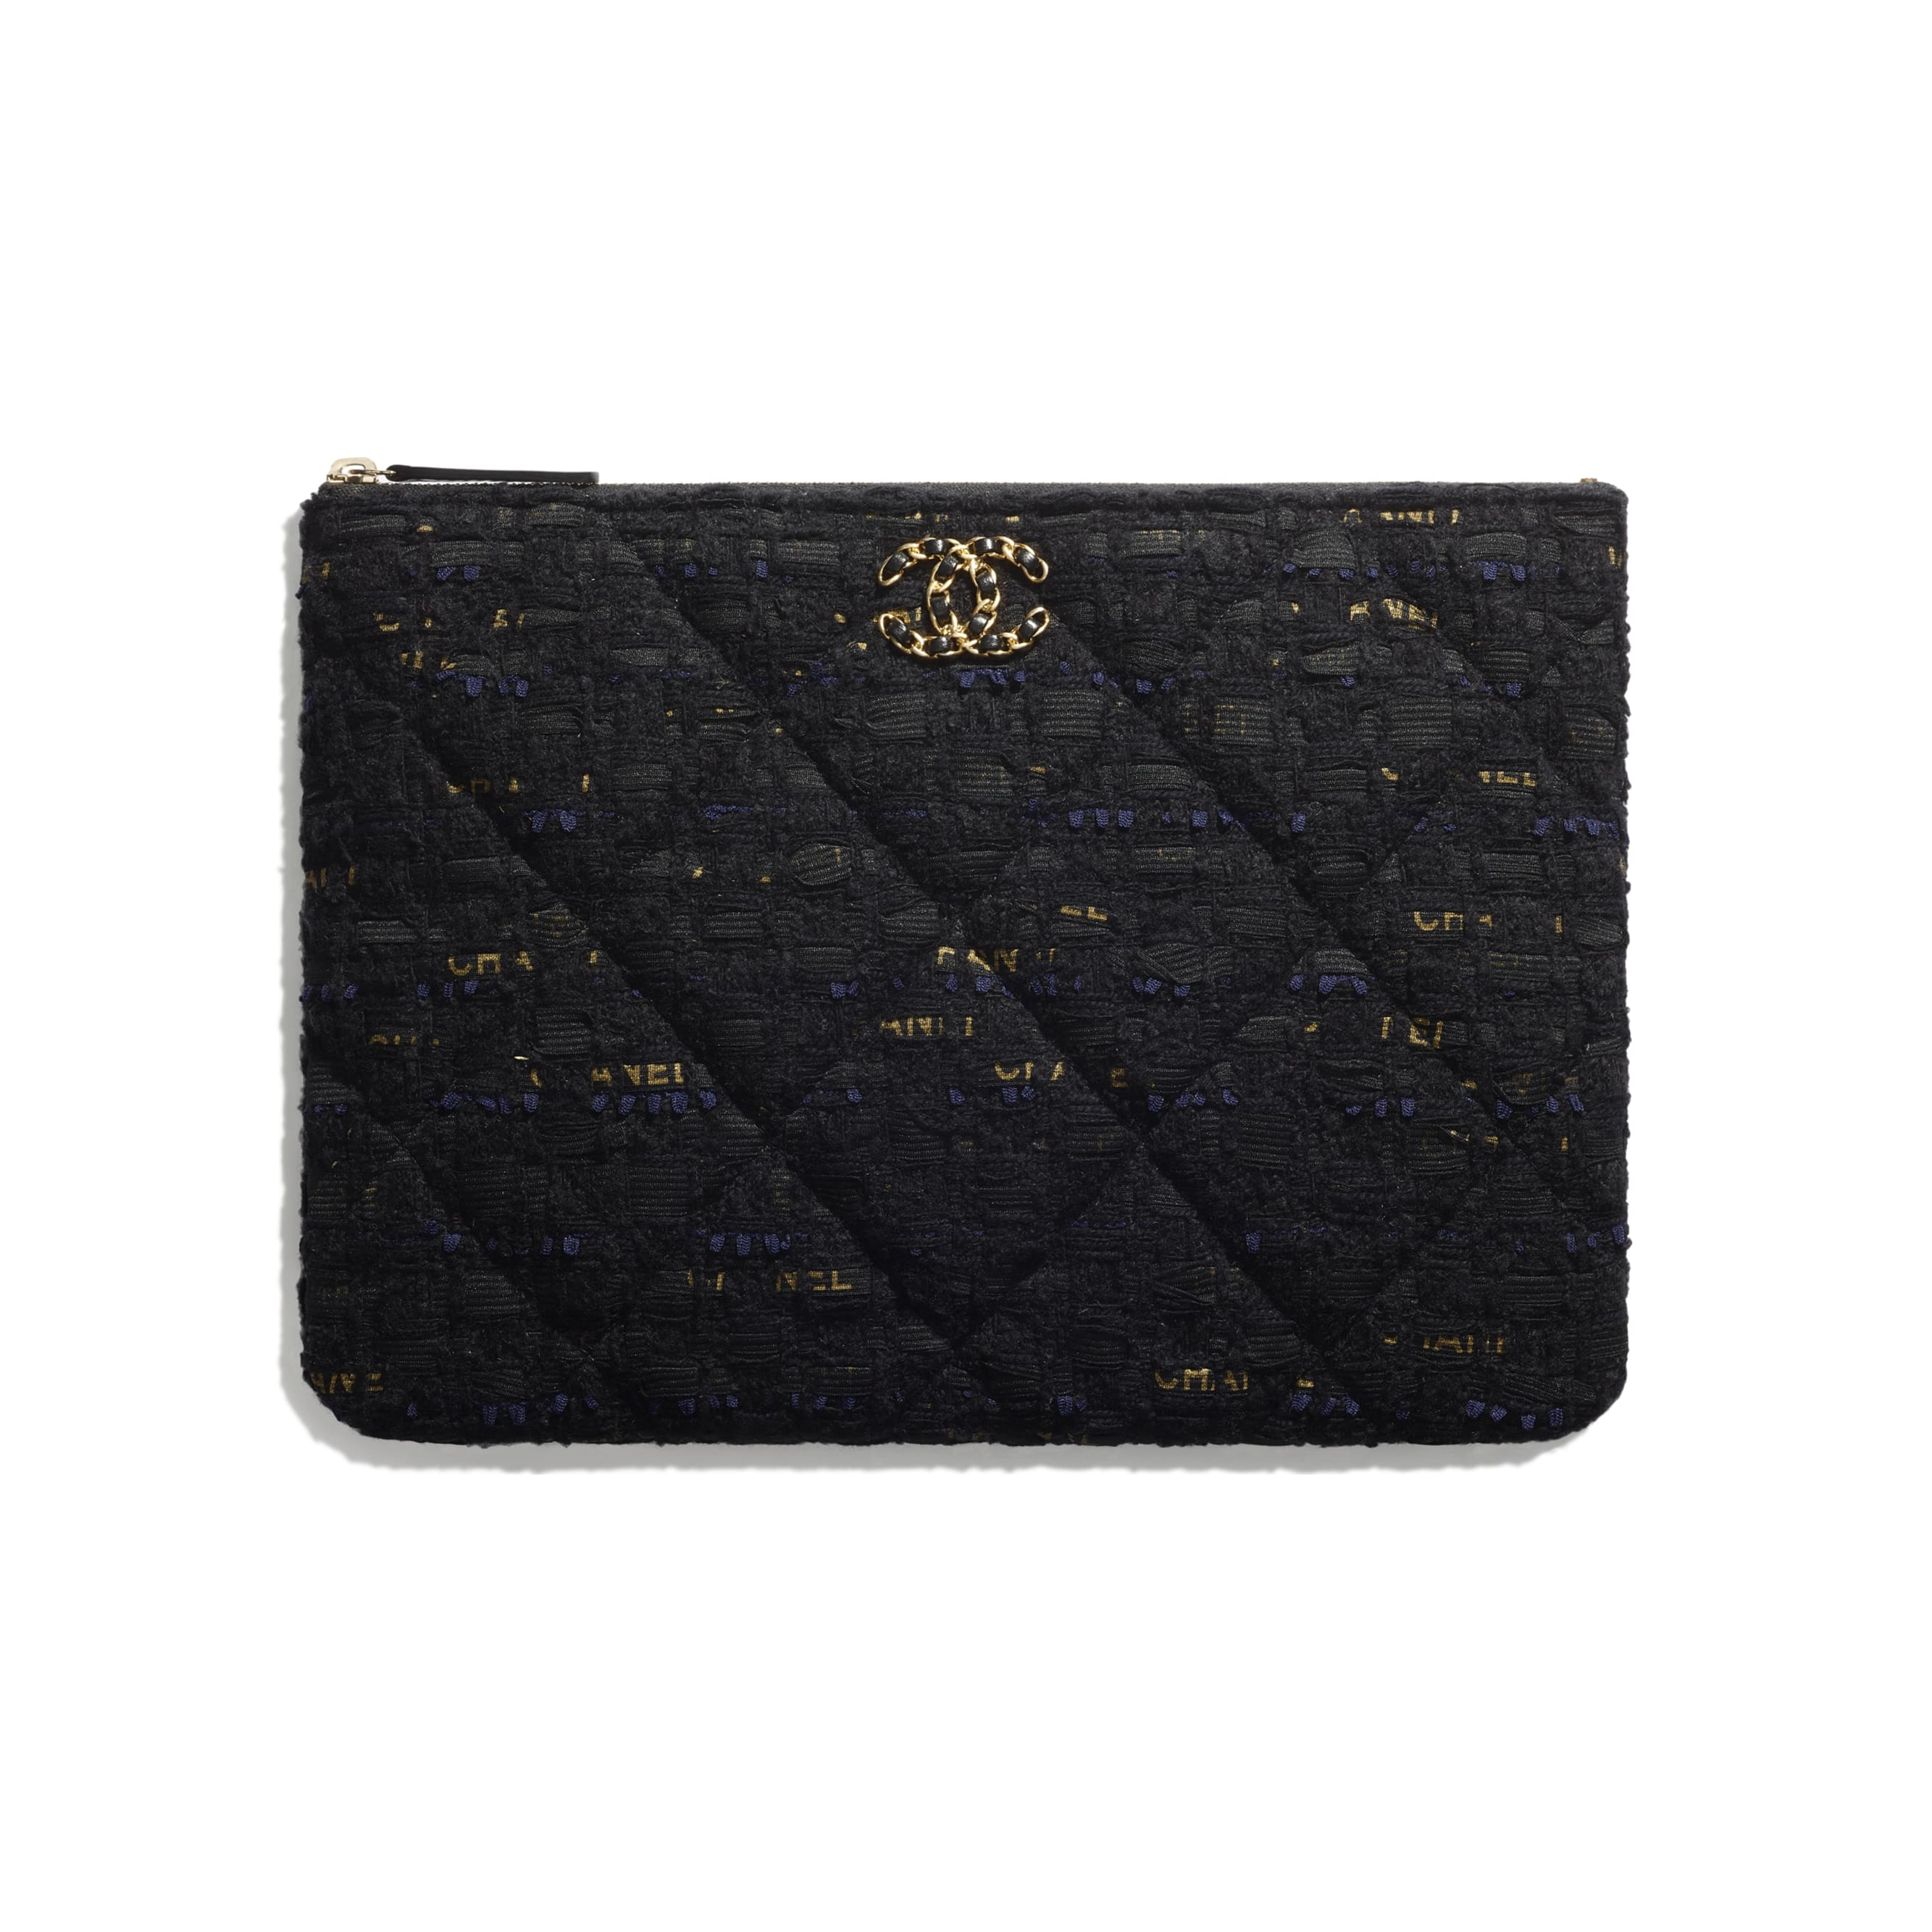 CHANEL 19手提包 - 黑、深藍及金色 - 斜紋軟呢及金色金屬 - CHANEL - 預設視圖 - 查看標準尺寸版本